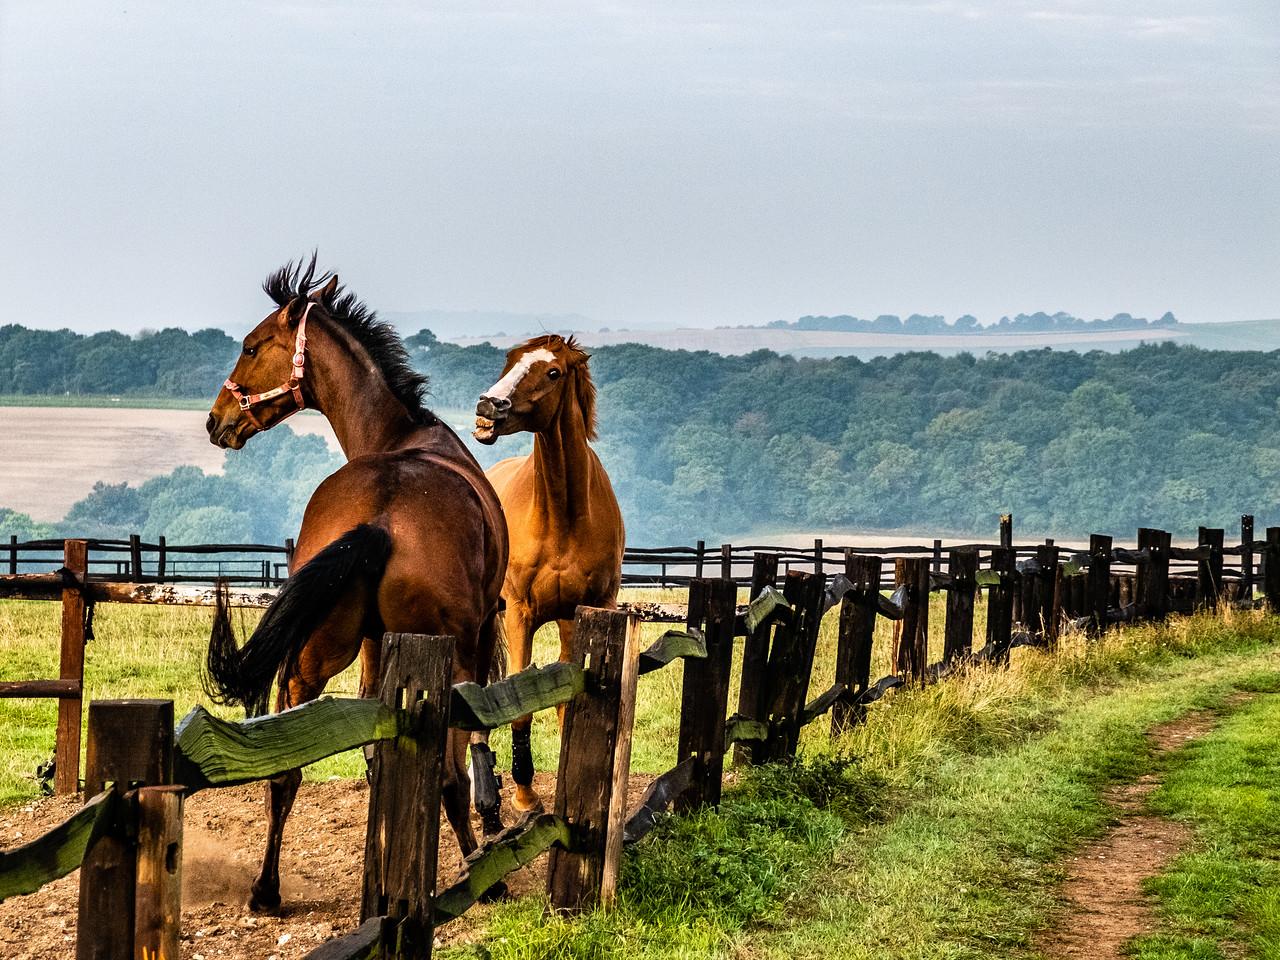 Horse Fight by Larry Van Howe